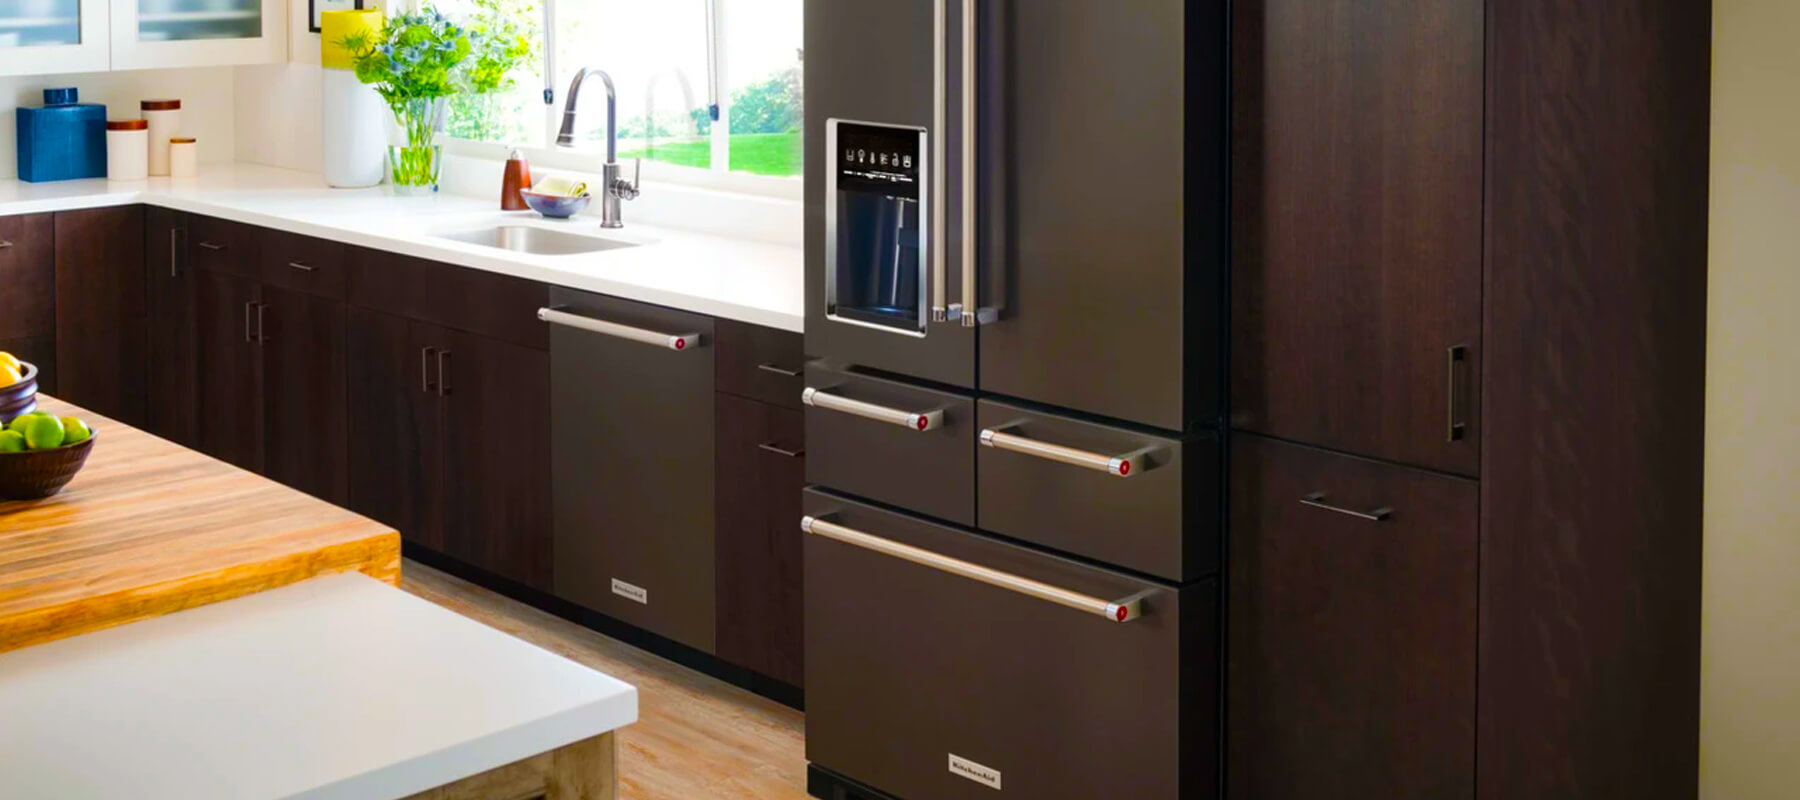 Kitchenaid Built in Refrigerator Repair Near Me | Built-in Refrigerator Repair